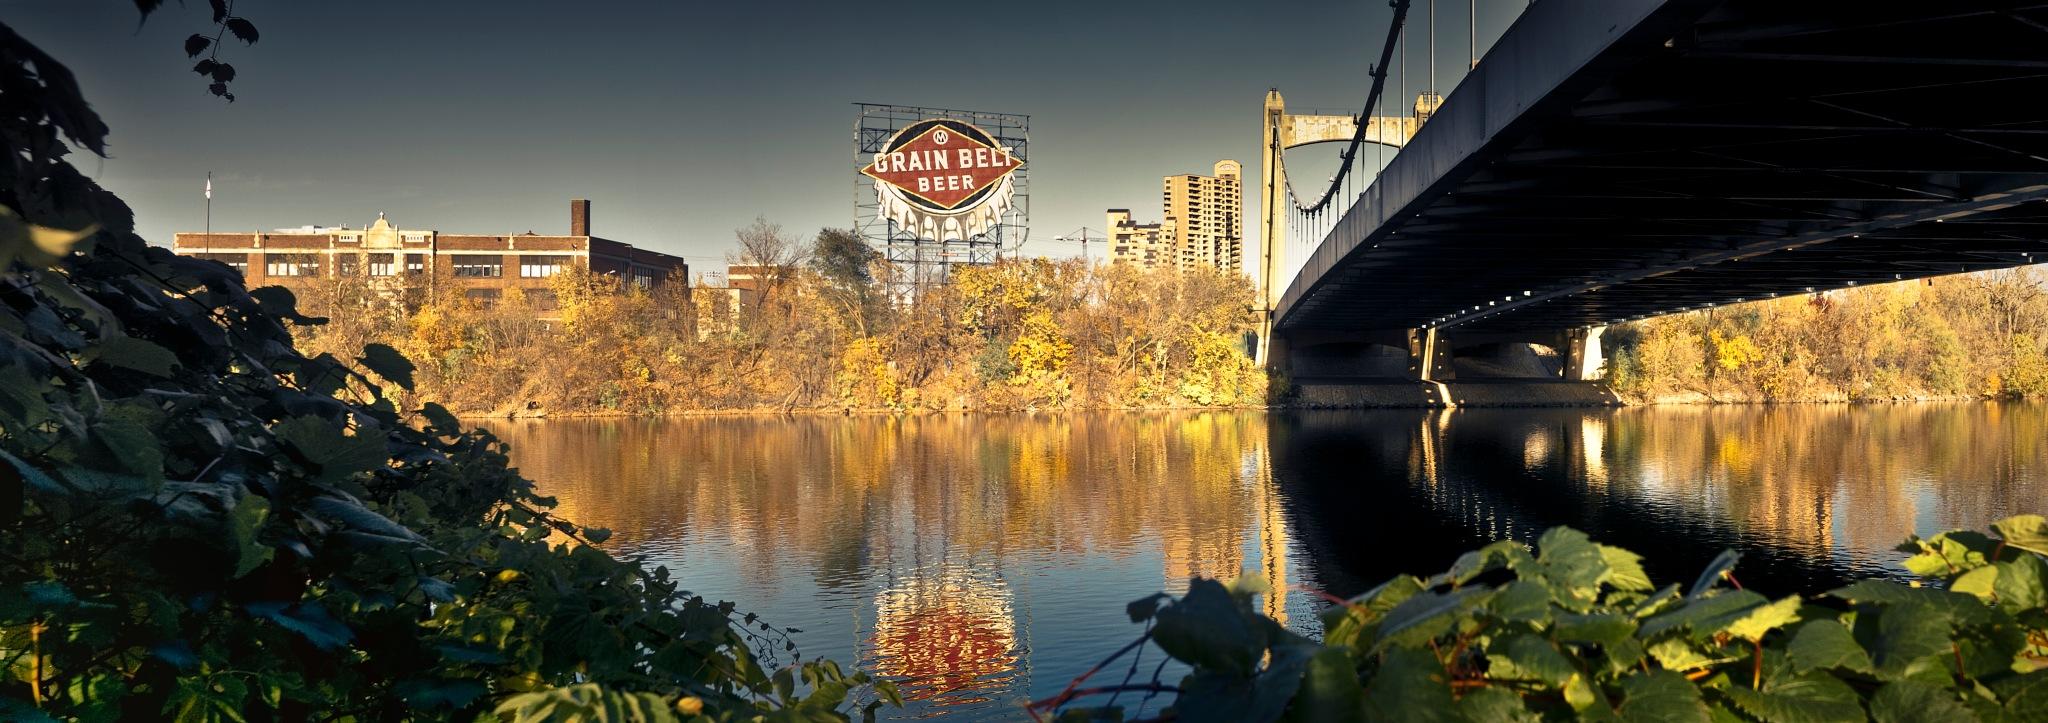 Grain Belt Beer Sign - Hennepin Ave. Bridge by Robert Henry